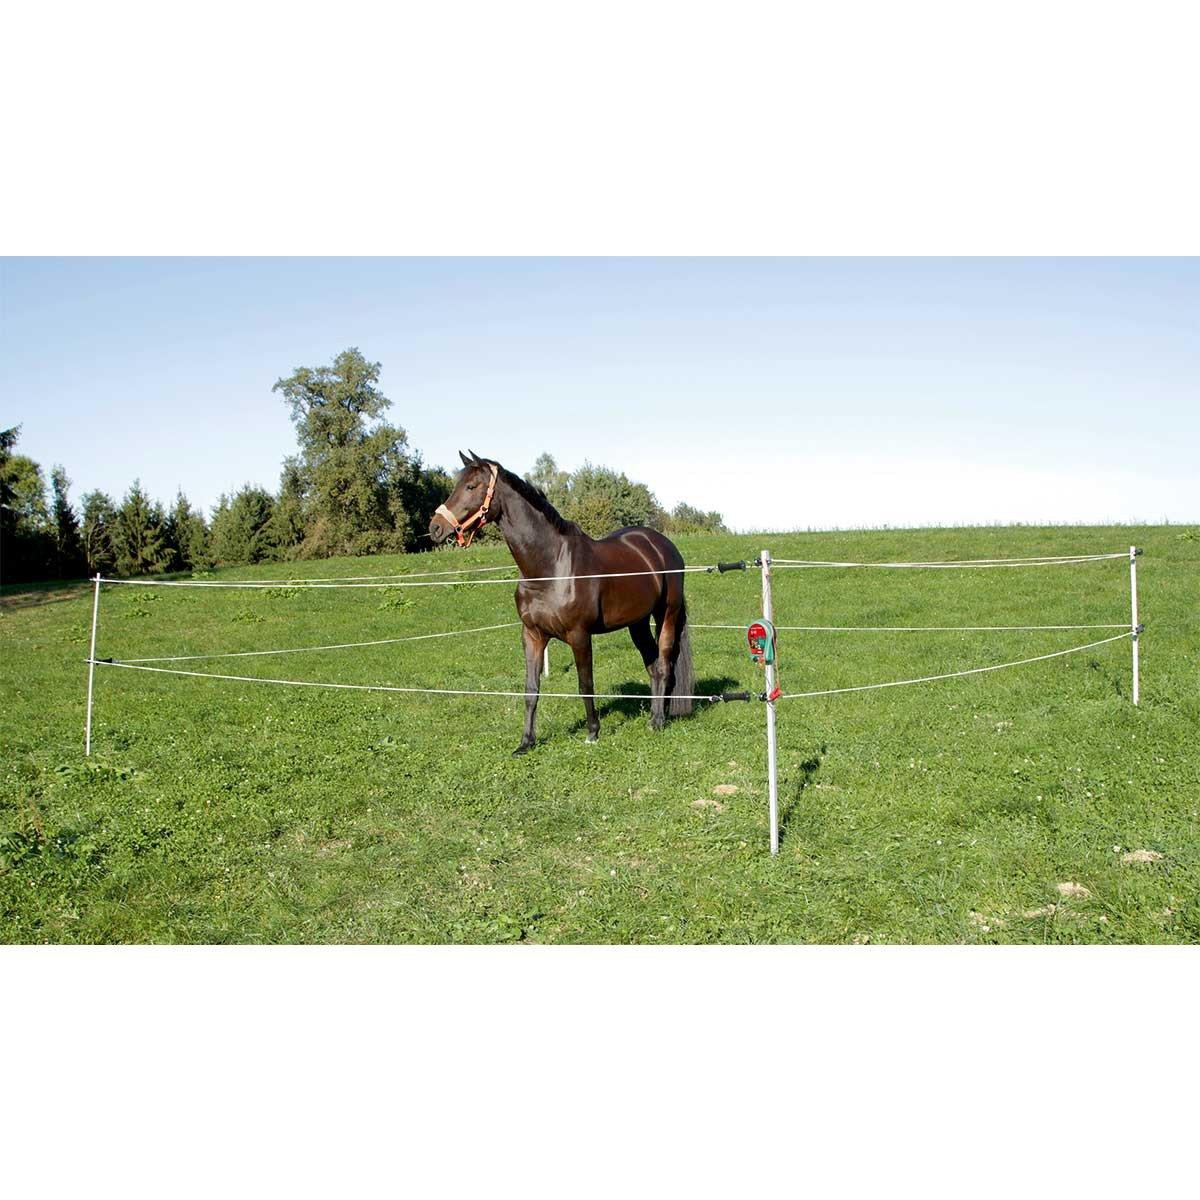 Ako Turnier/Paddock Set 7 x 7 m ohne Gerät